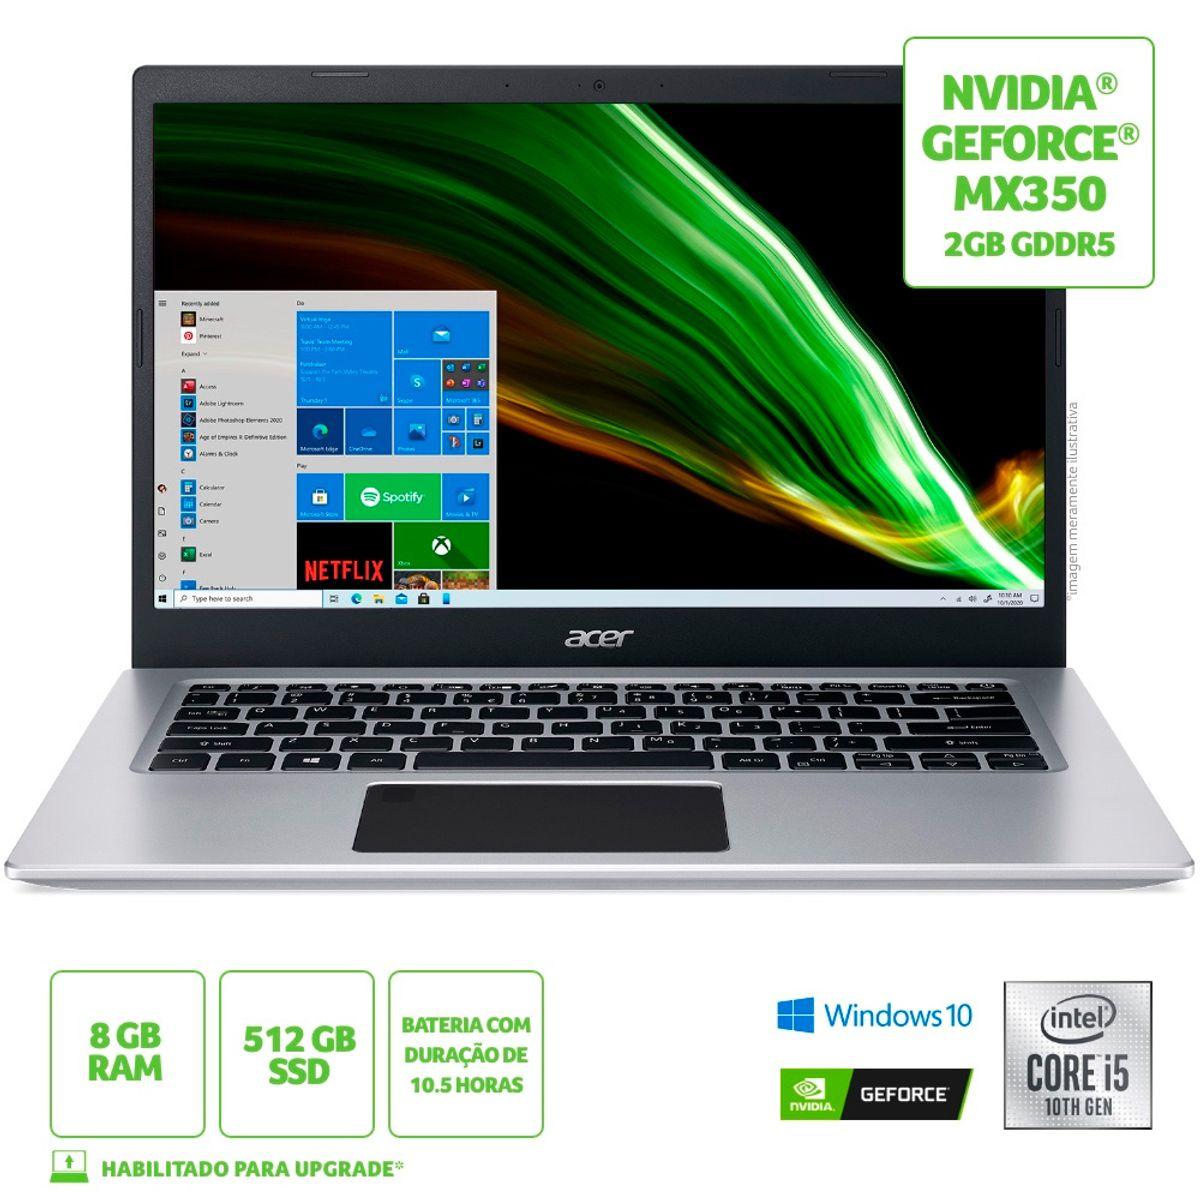 "Notebook - Acer A514-53g-571x I5-1035g1 2.40ghz 8gb 512gb Ssd Geforce Mx350 Windows 10 Home Aspire 5 14"" Polegadas"